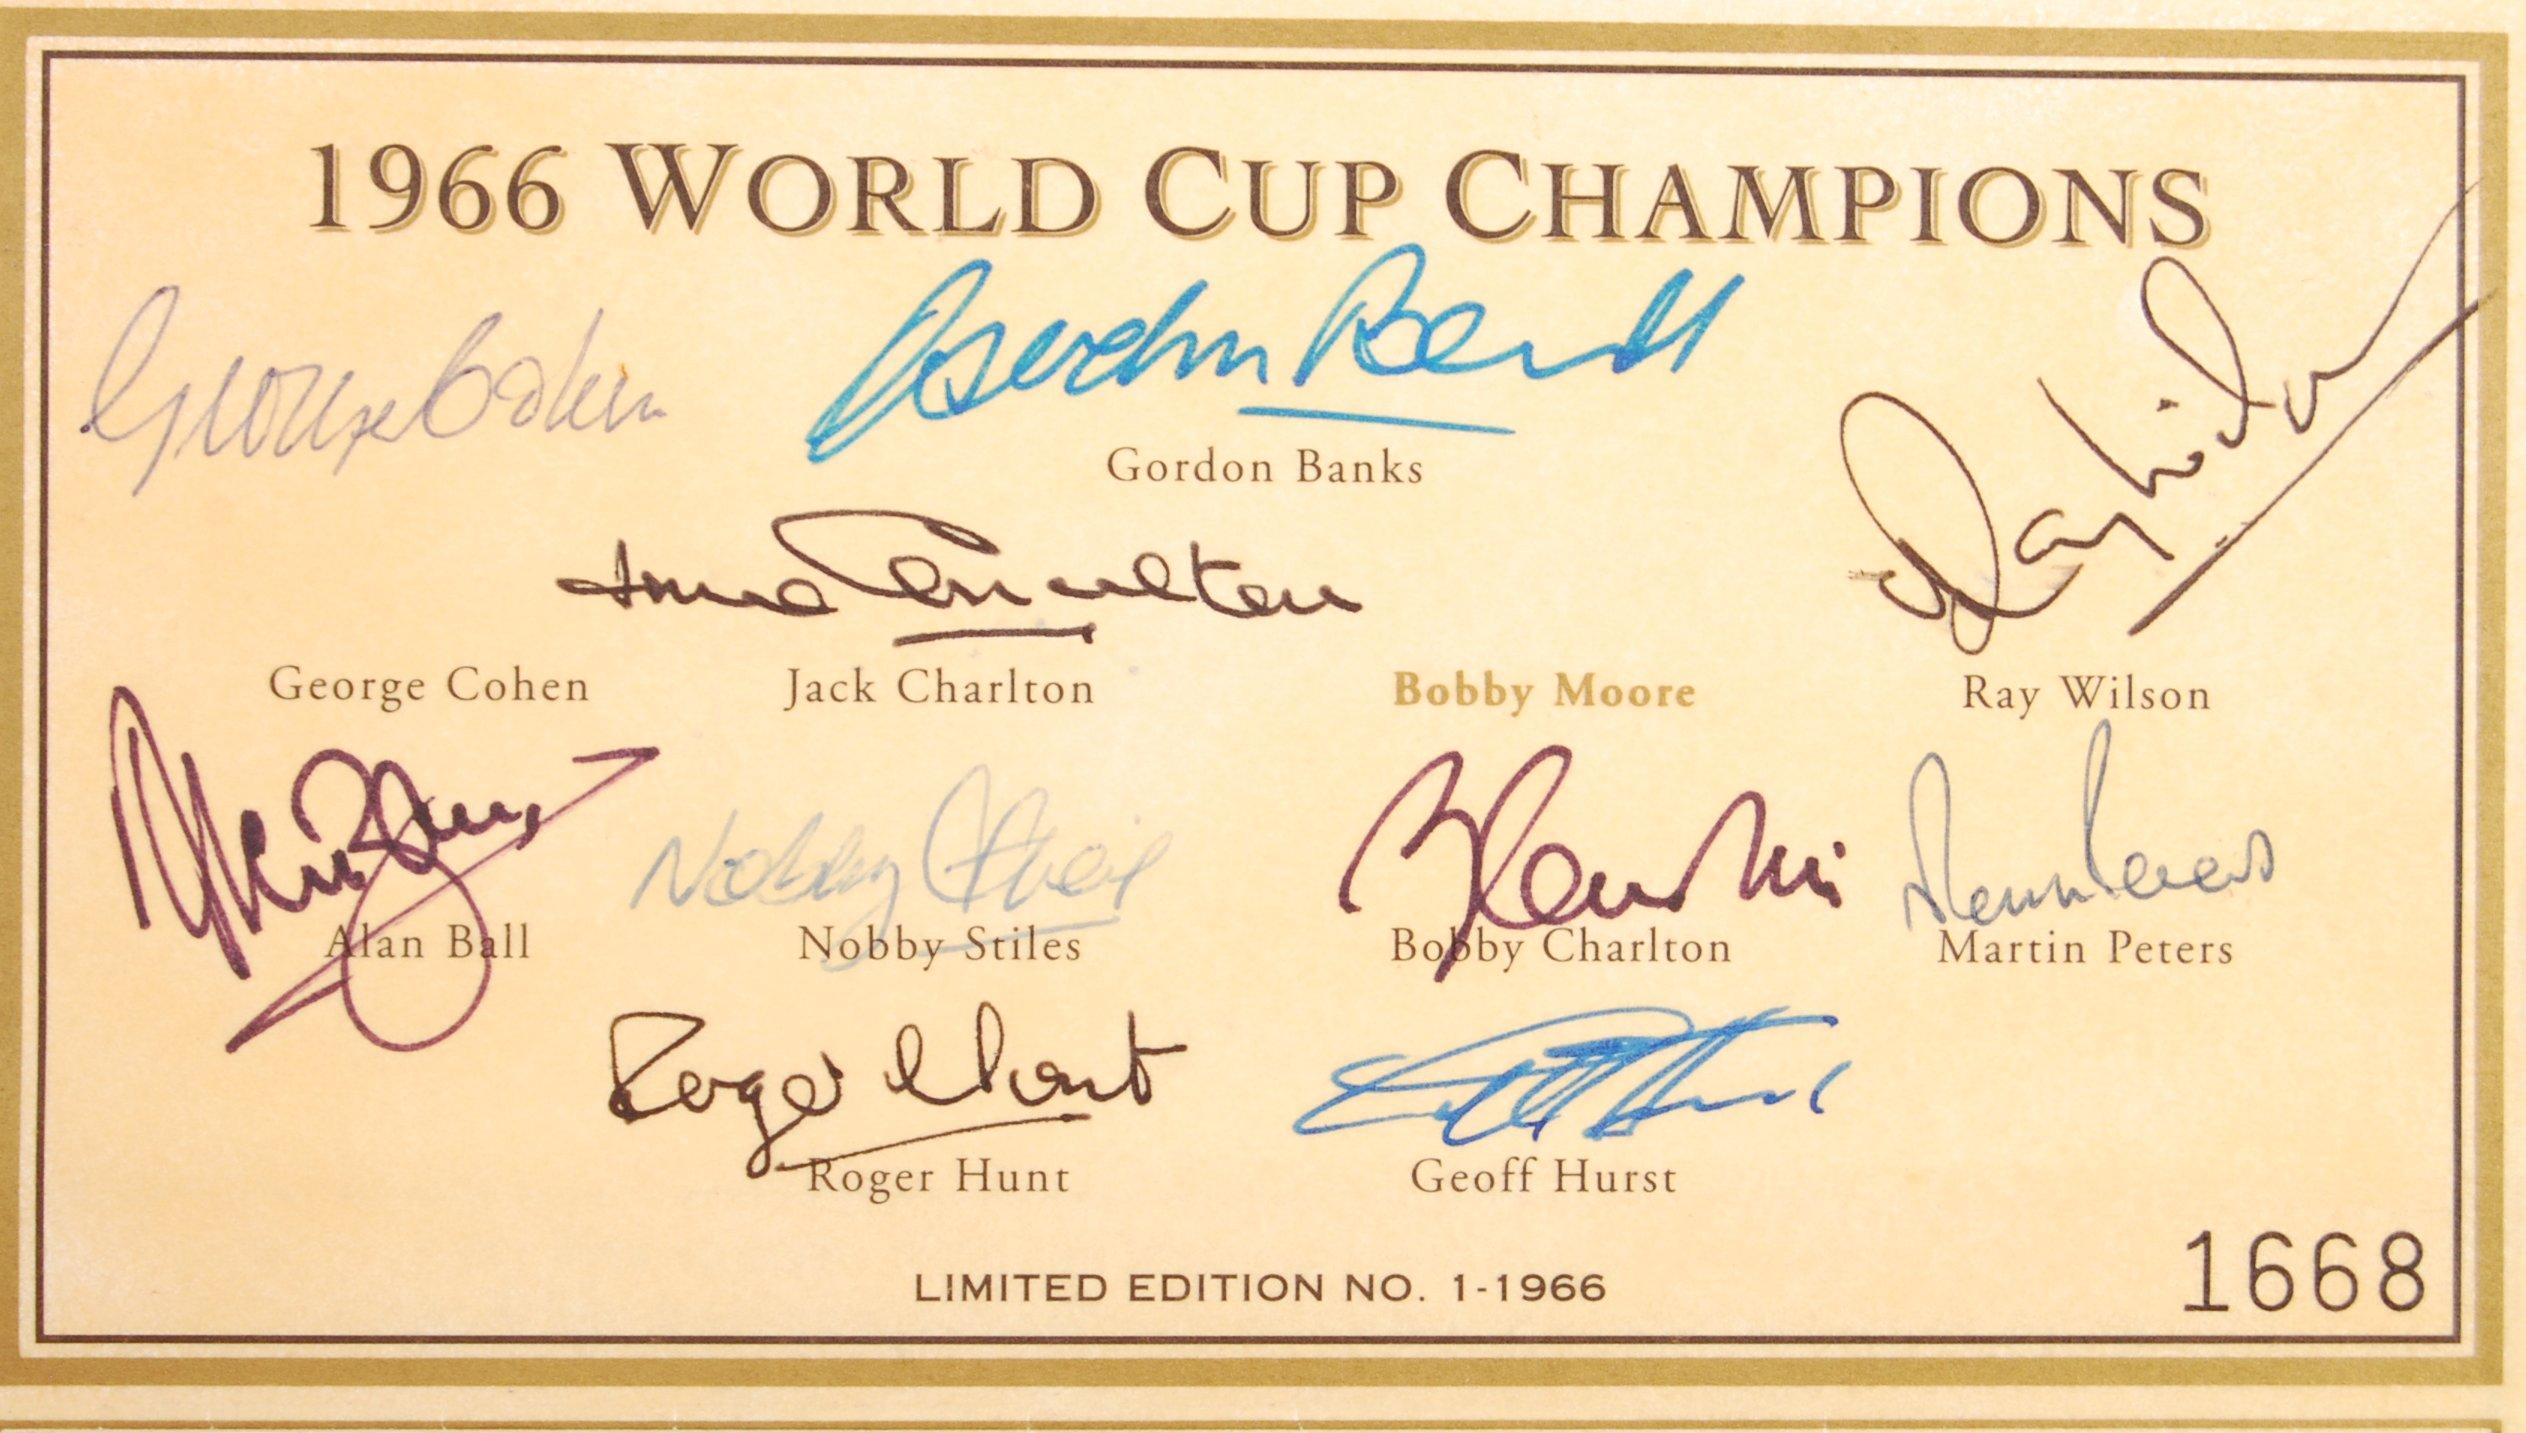 WORLD CUP 1966 - ENGLAND FOOTBALL AUTOGRAPHS - SET - Image 2 of 2